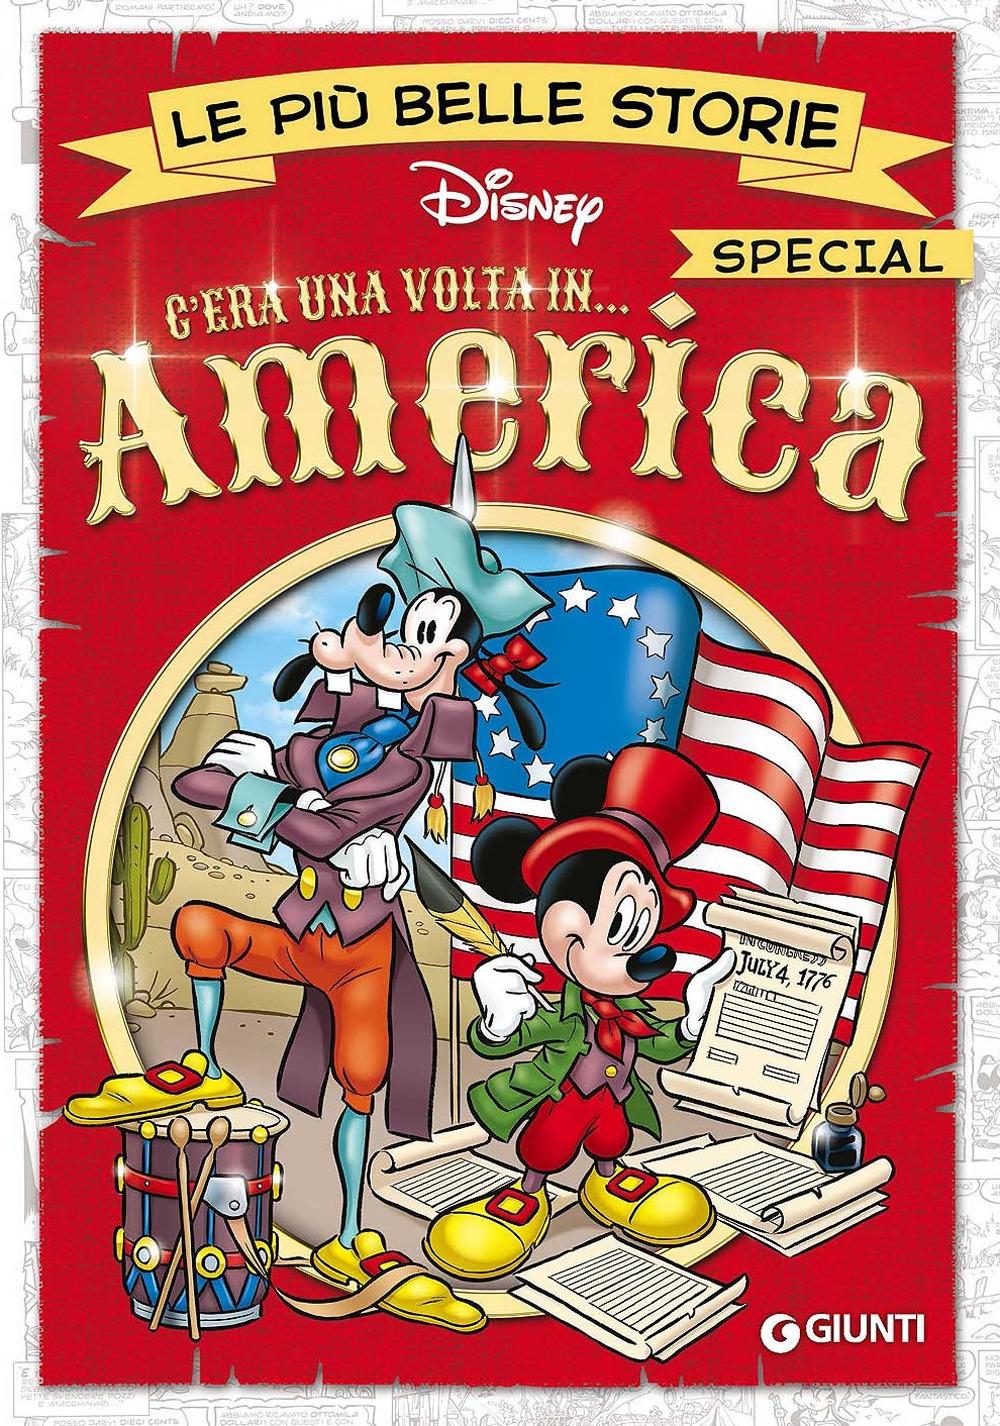 C'era una volta in... America. Le più belle storie special